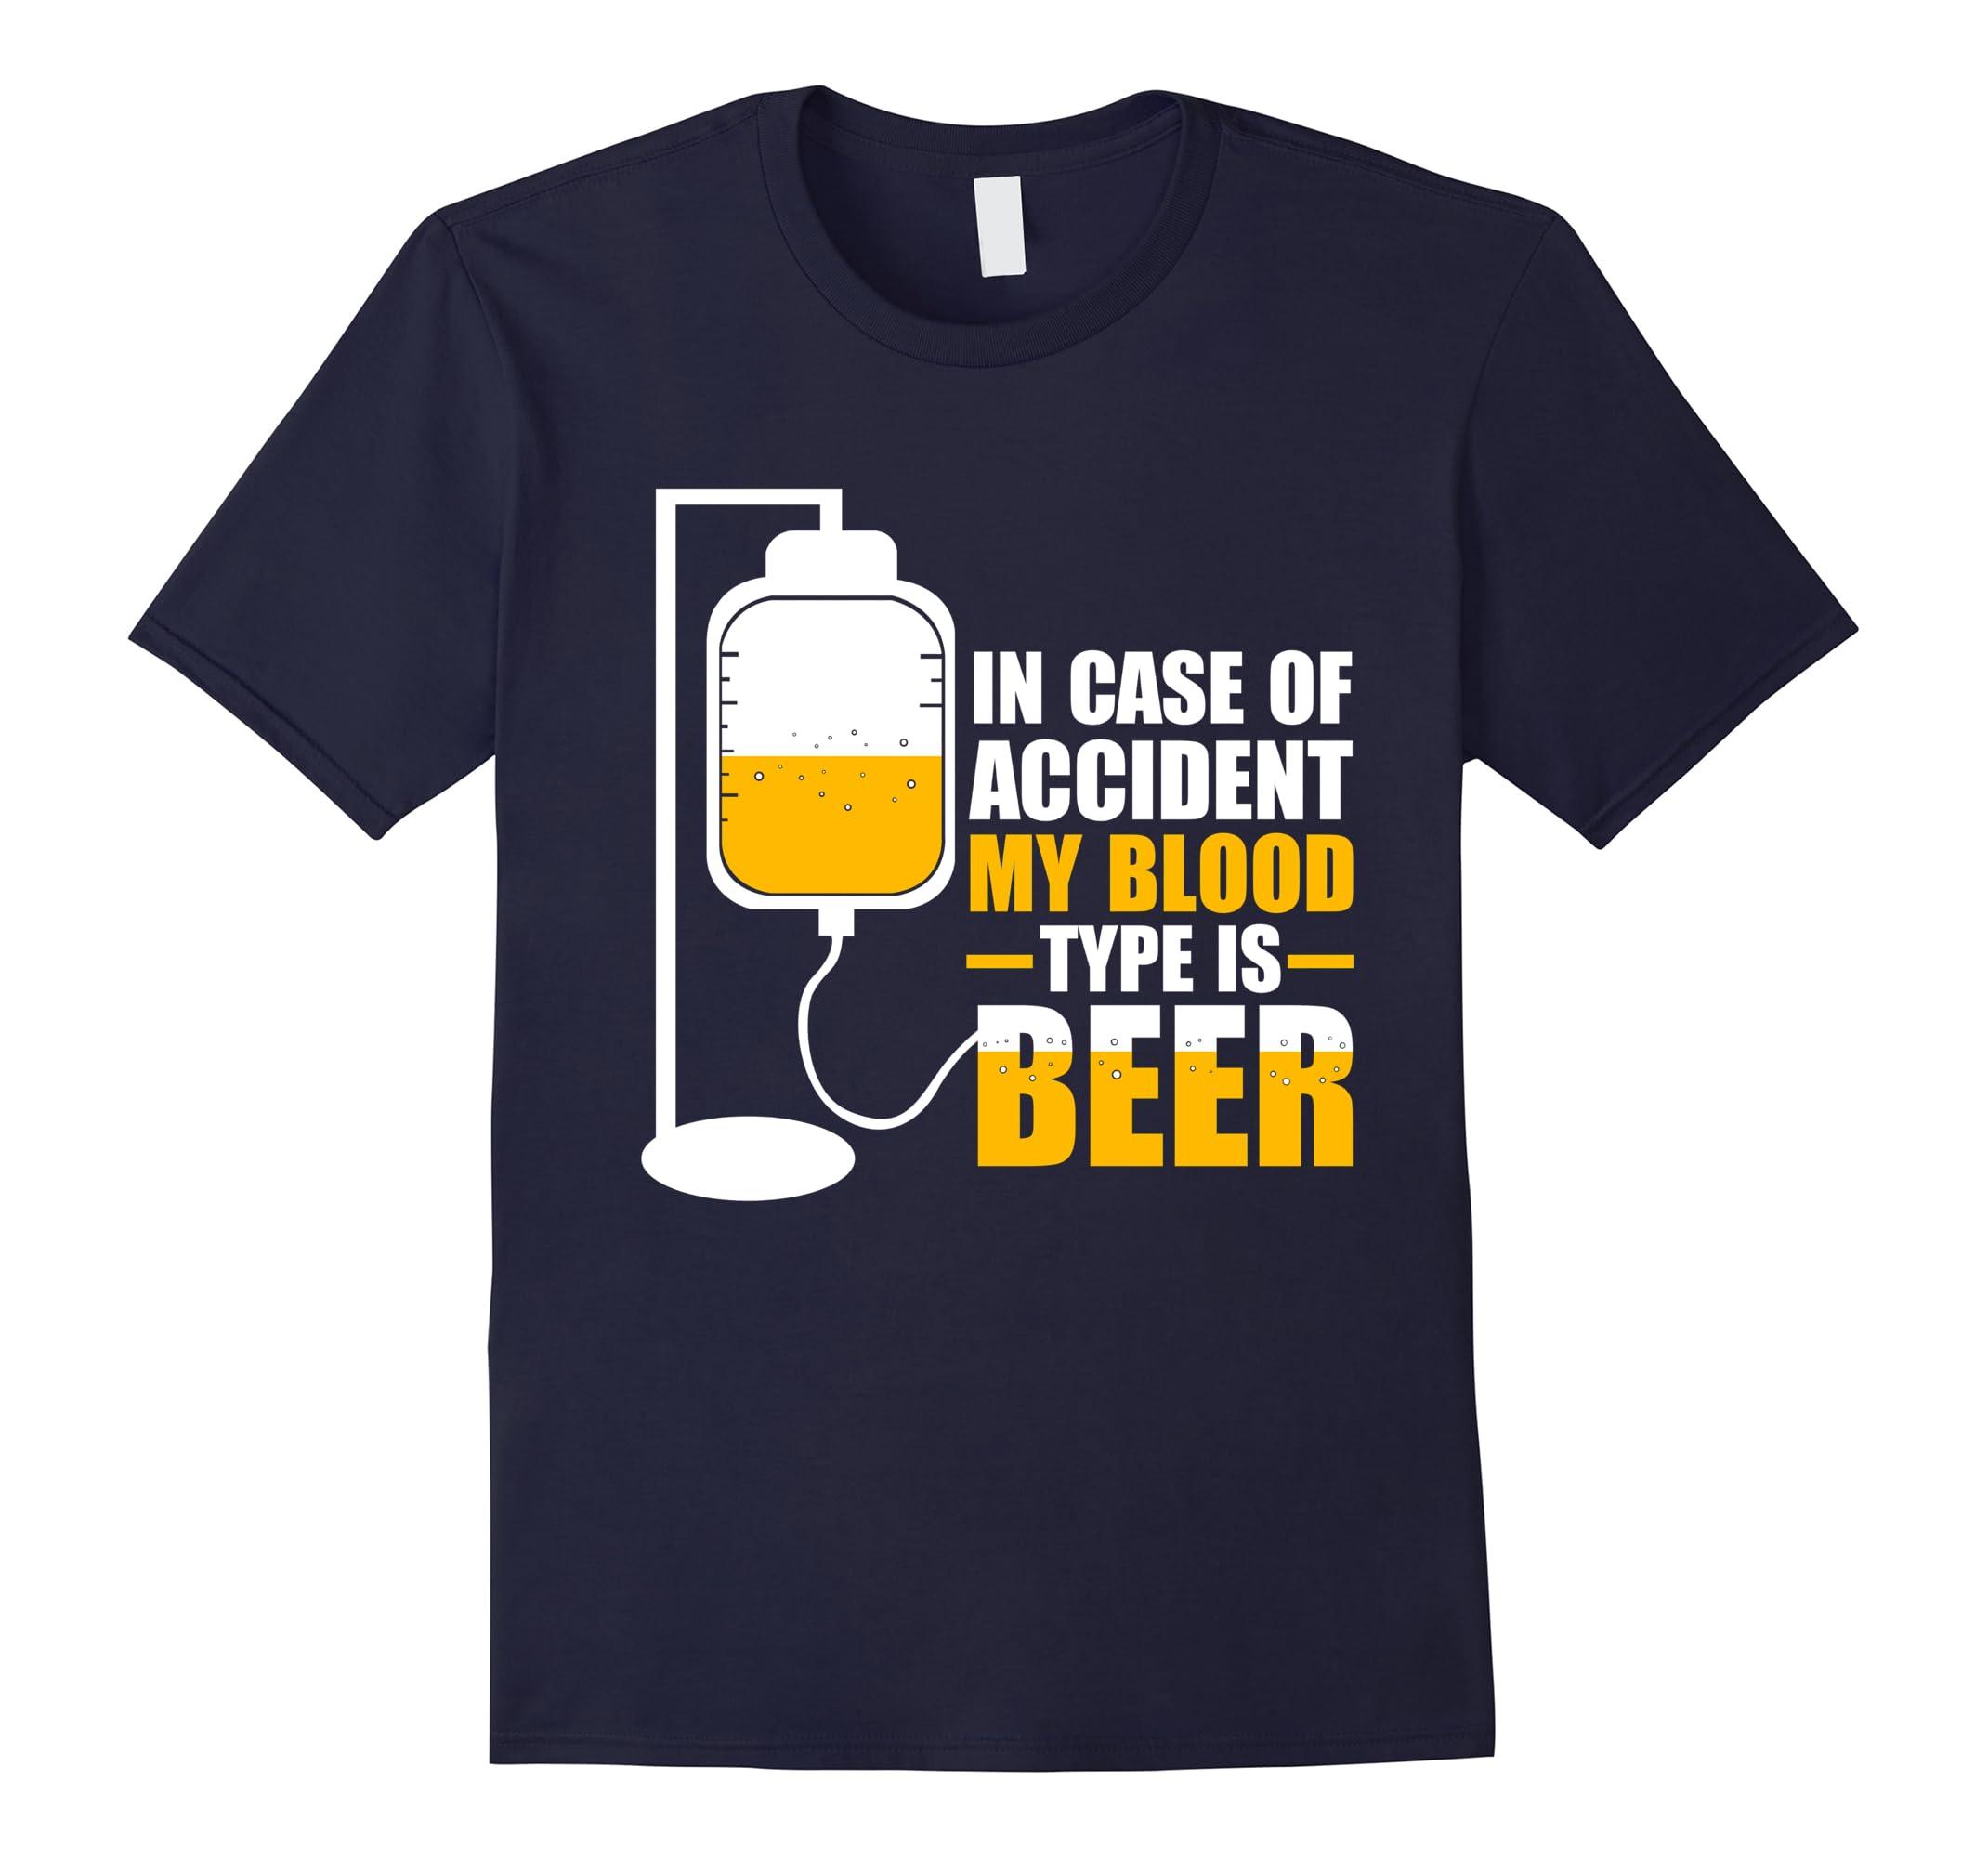 Accident Blood Beer shirt Funny-Awarplus